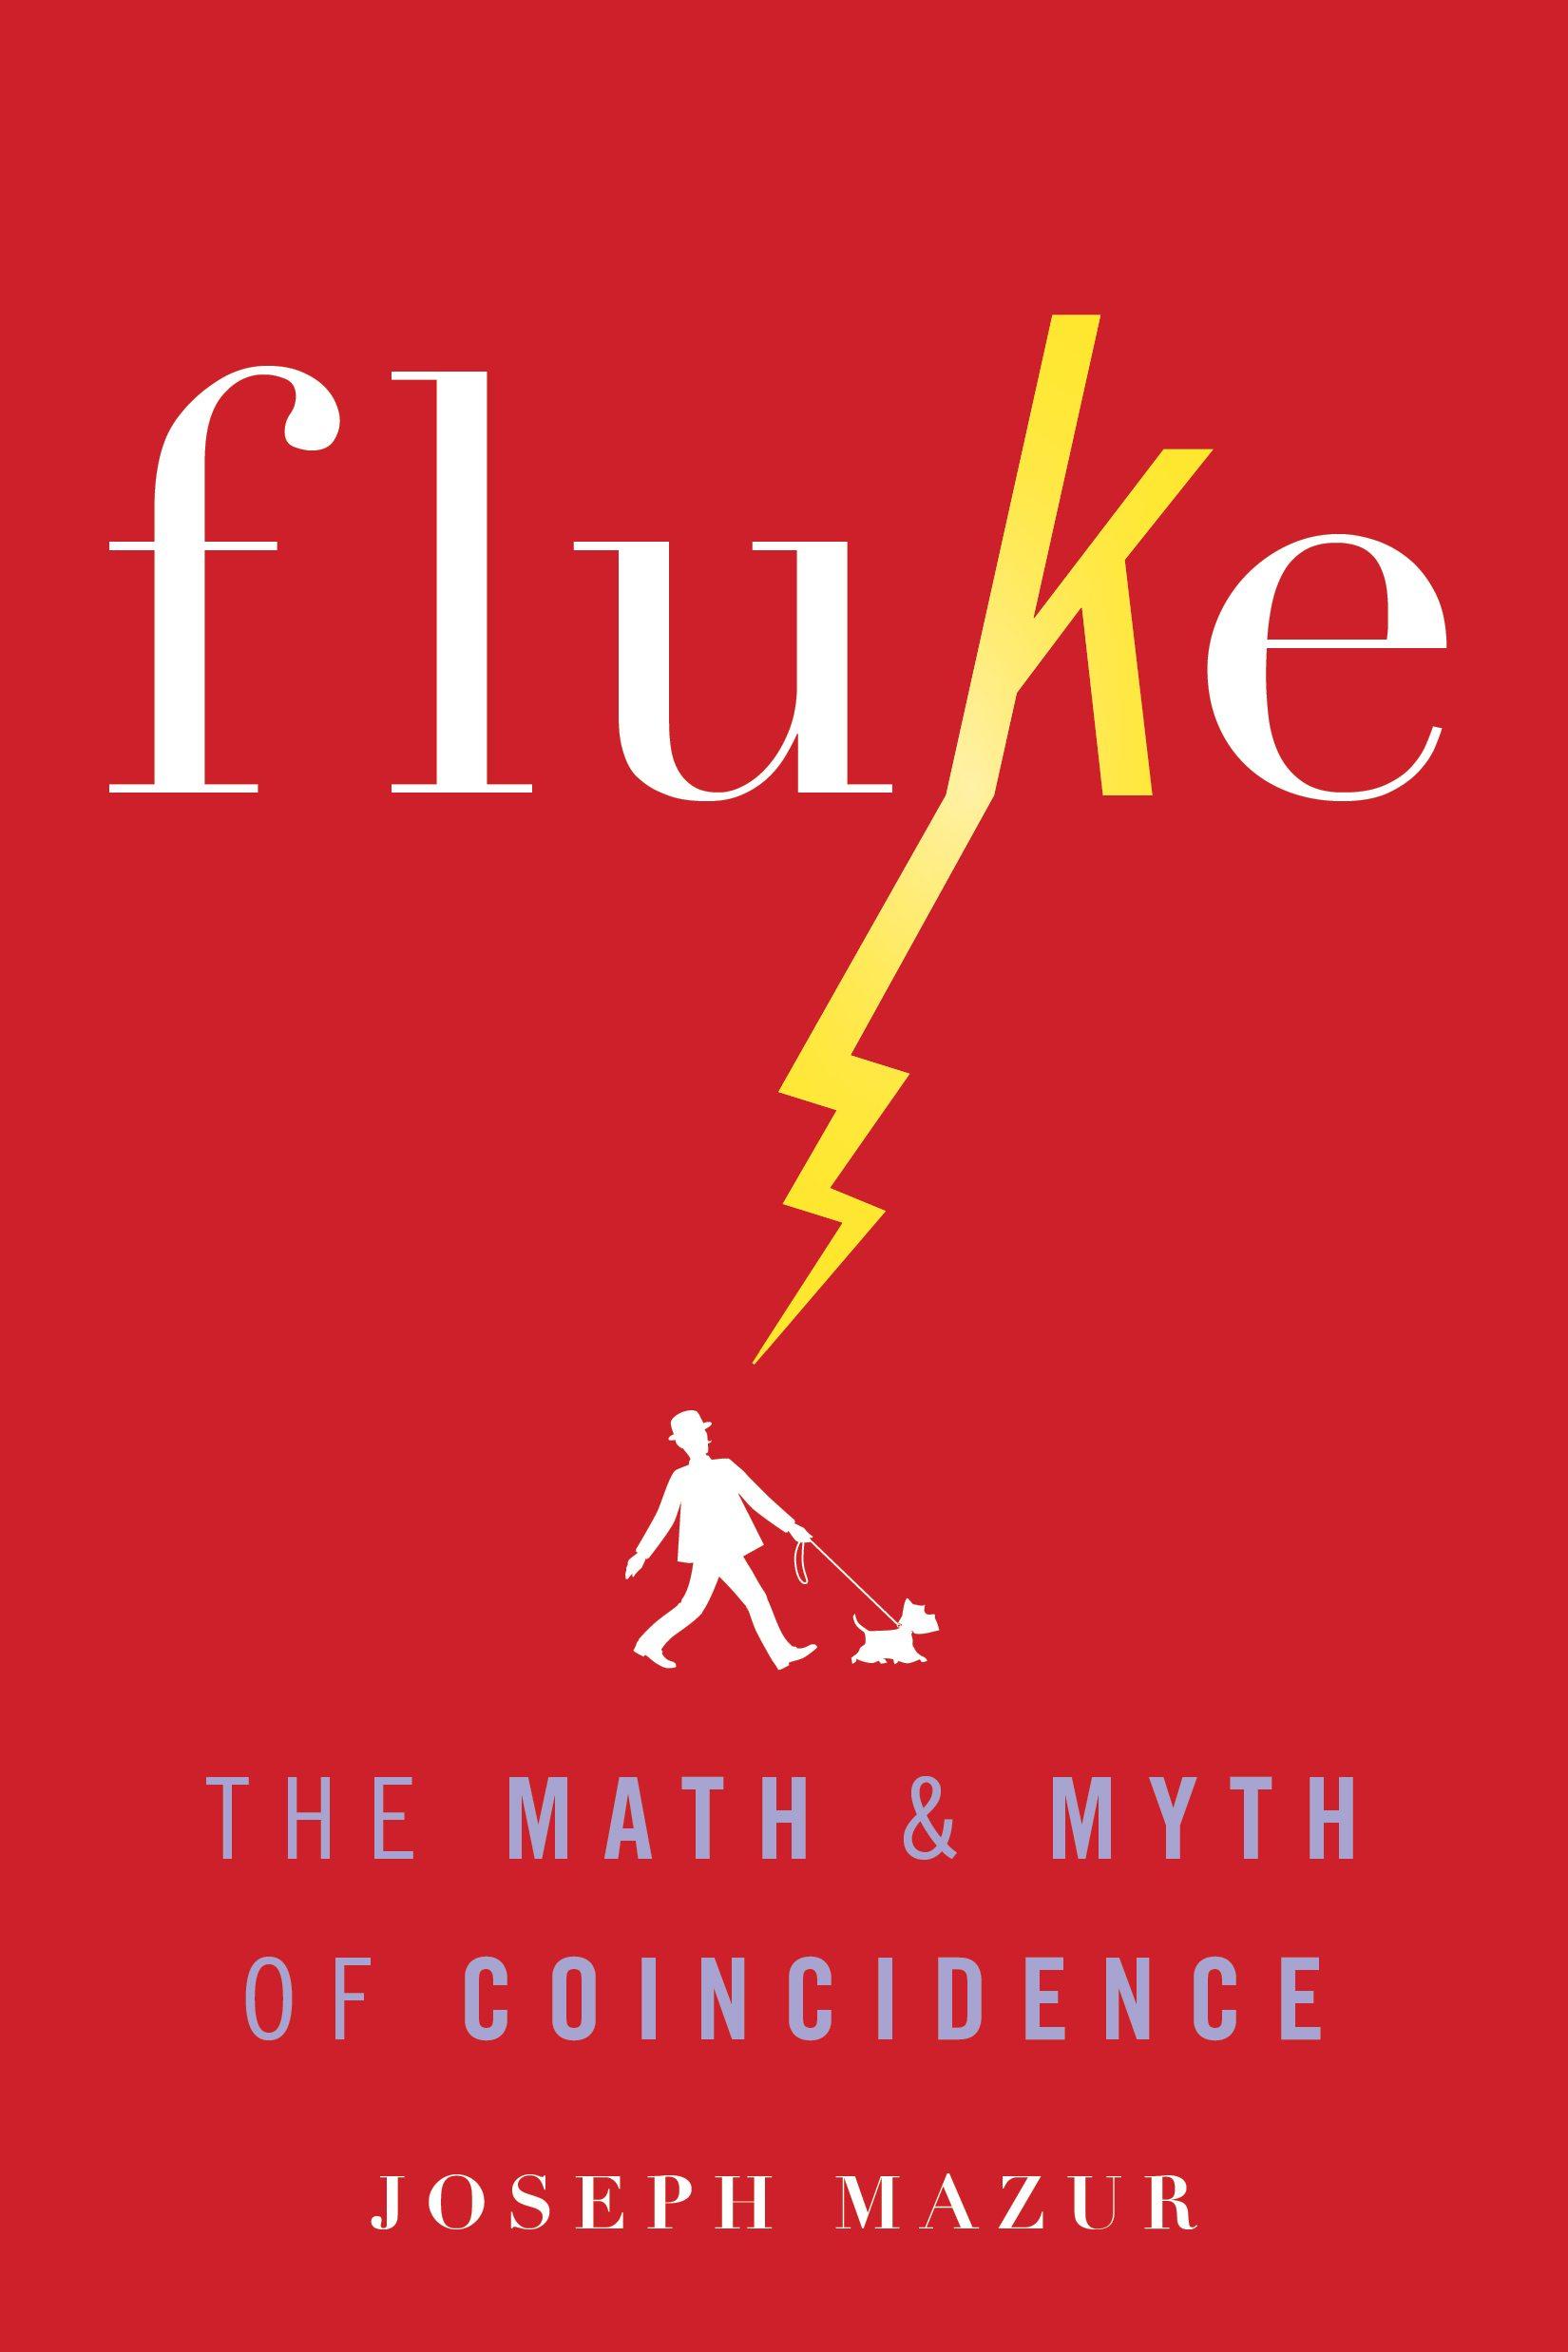 Fluke: The Math and Myth of Coincidence